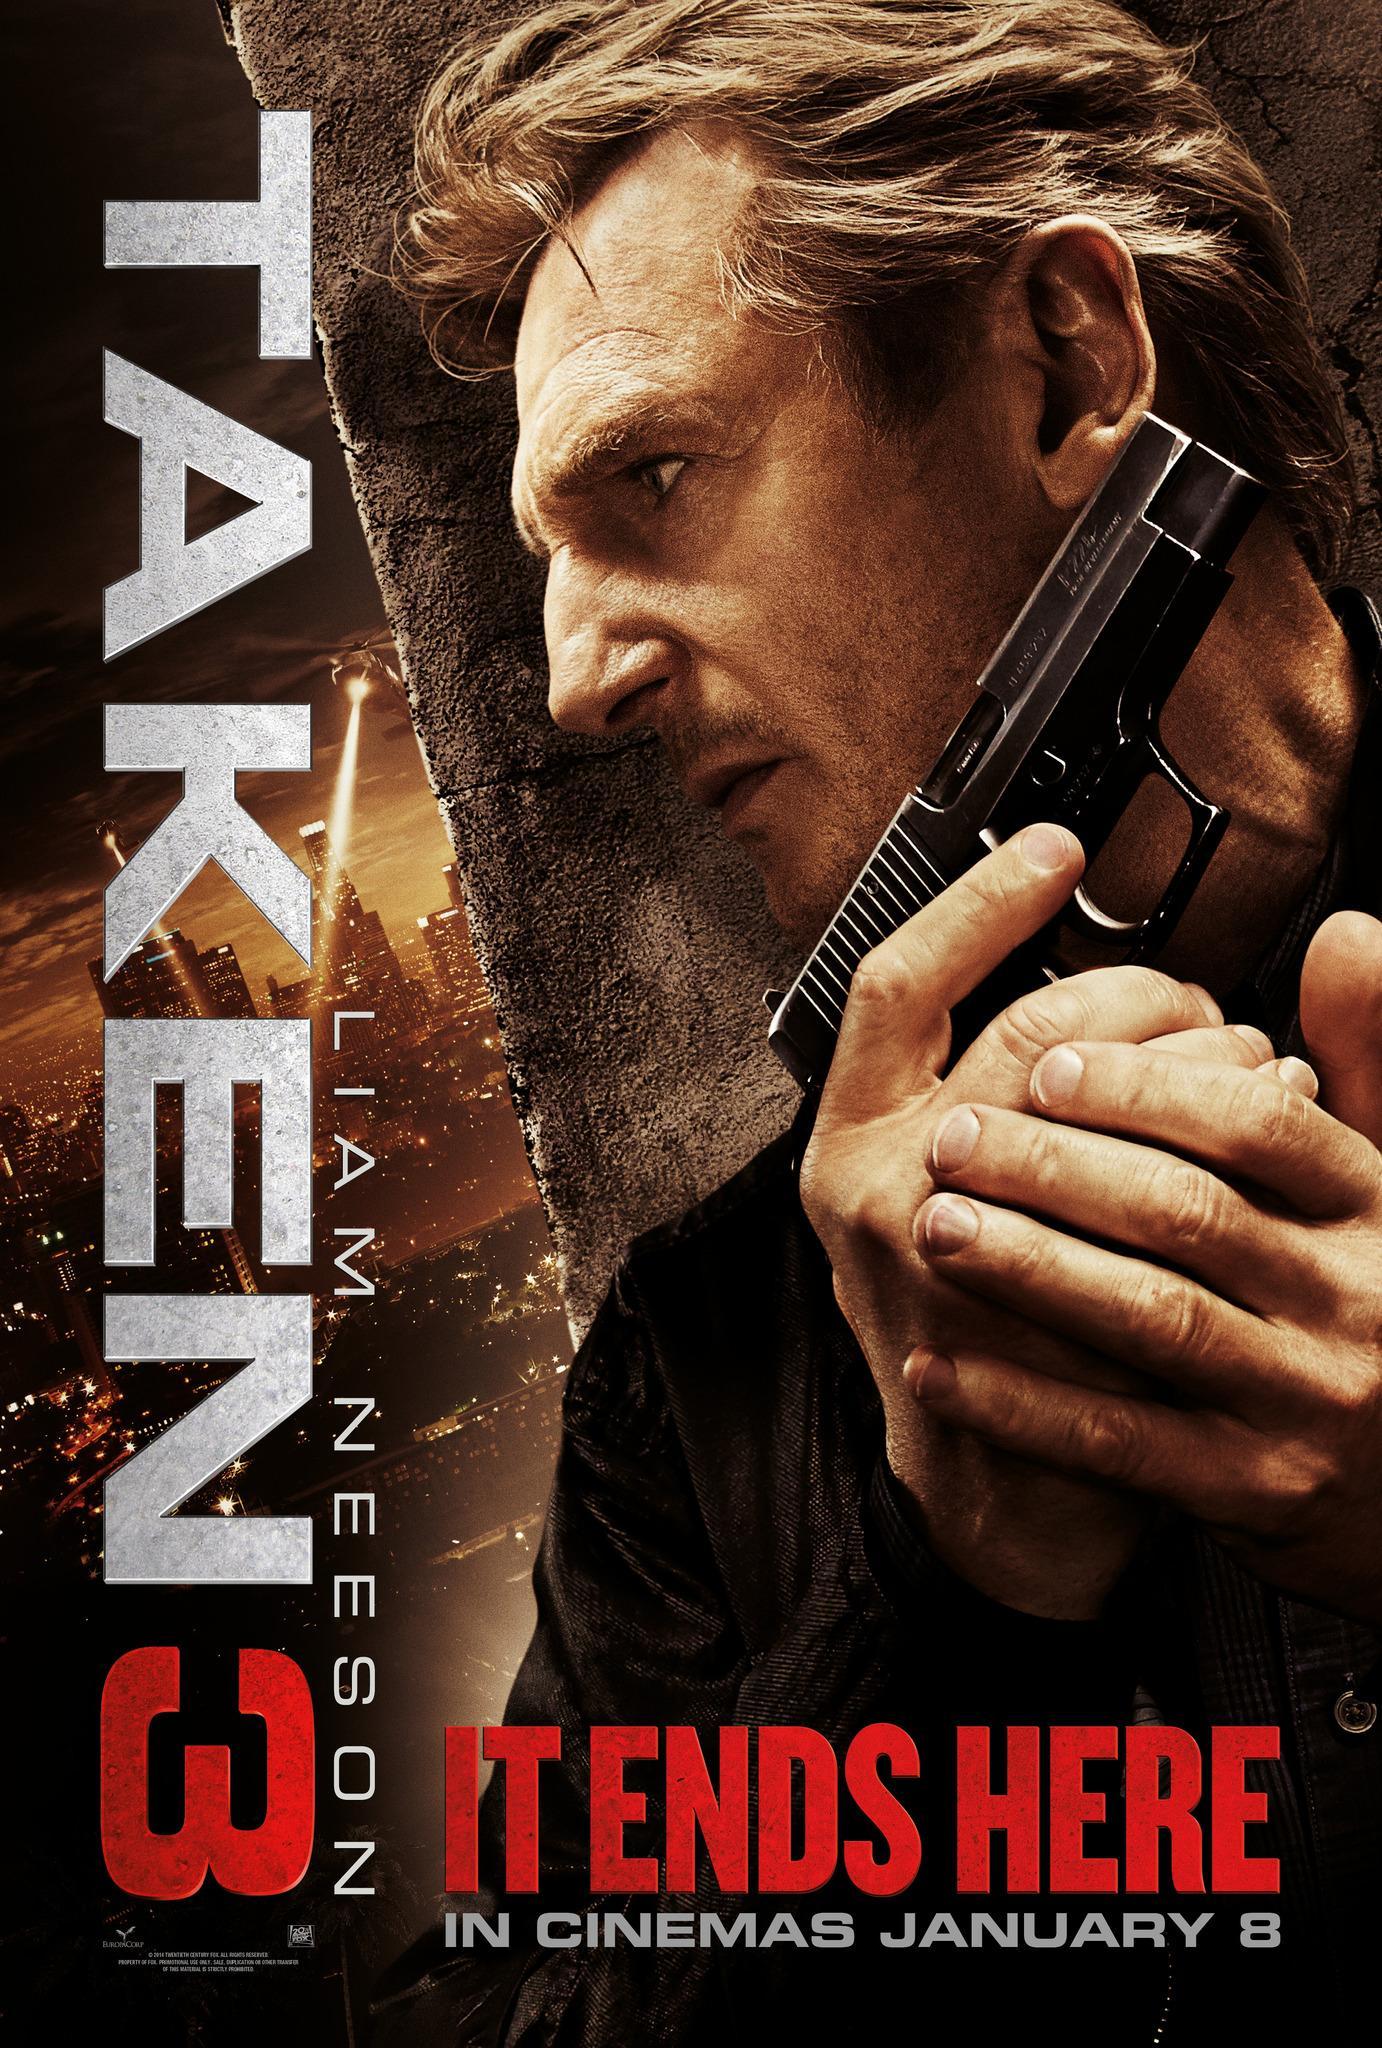 Watch New Taken 3 Trailer Featuring Liam Neeson